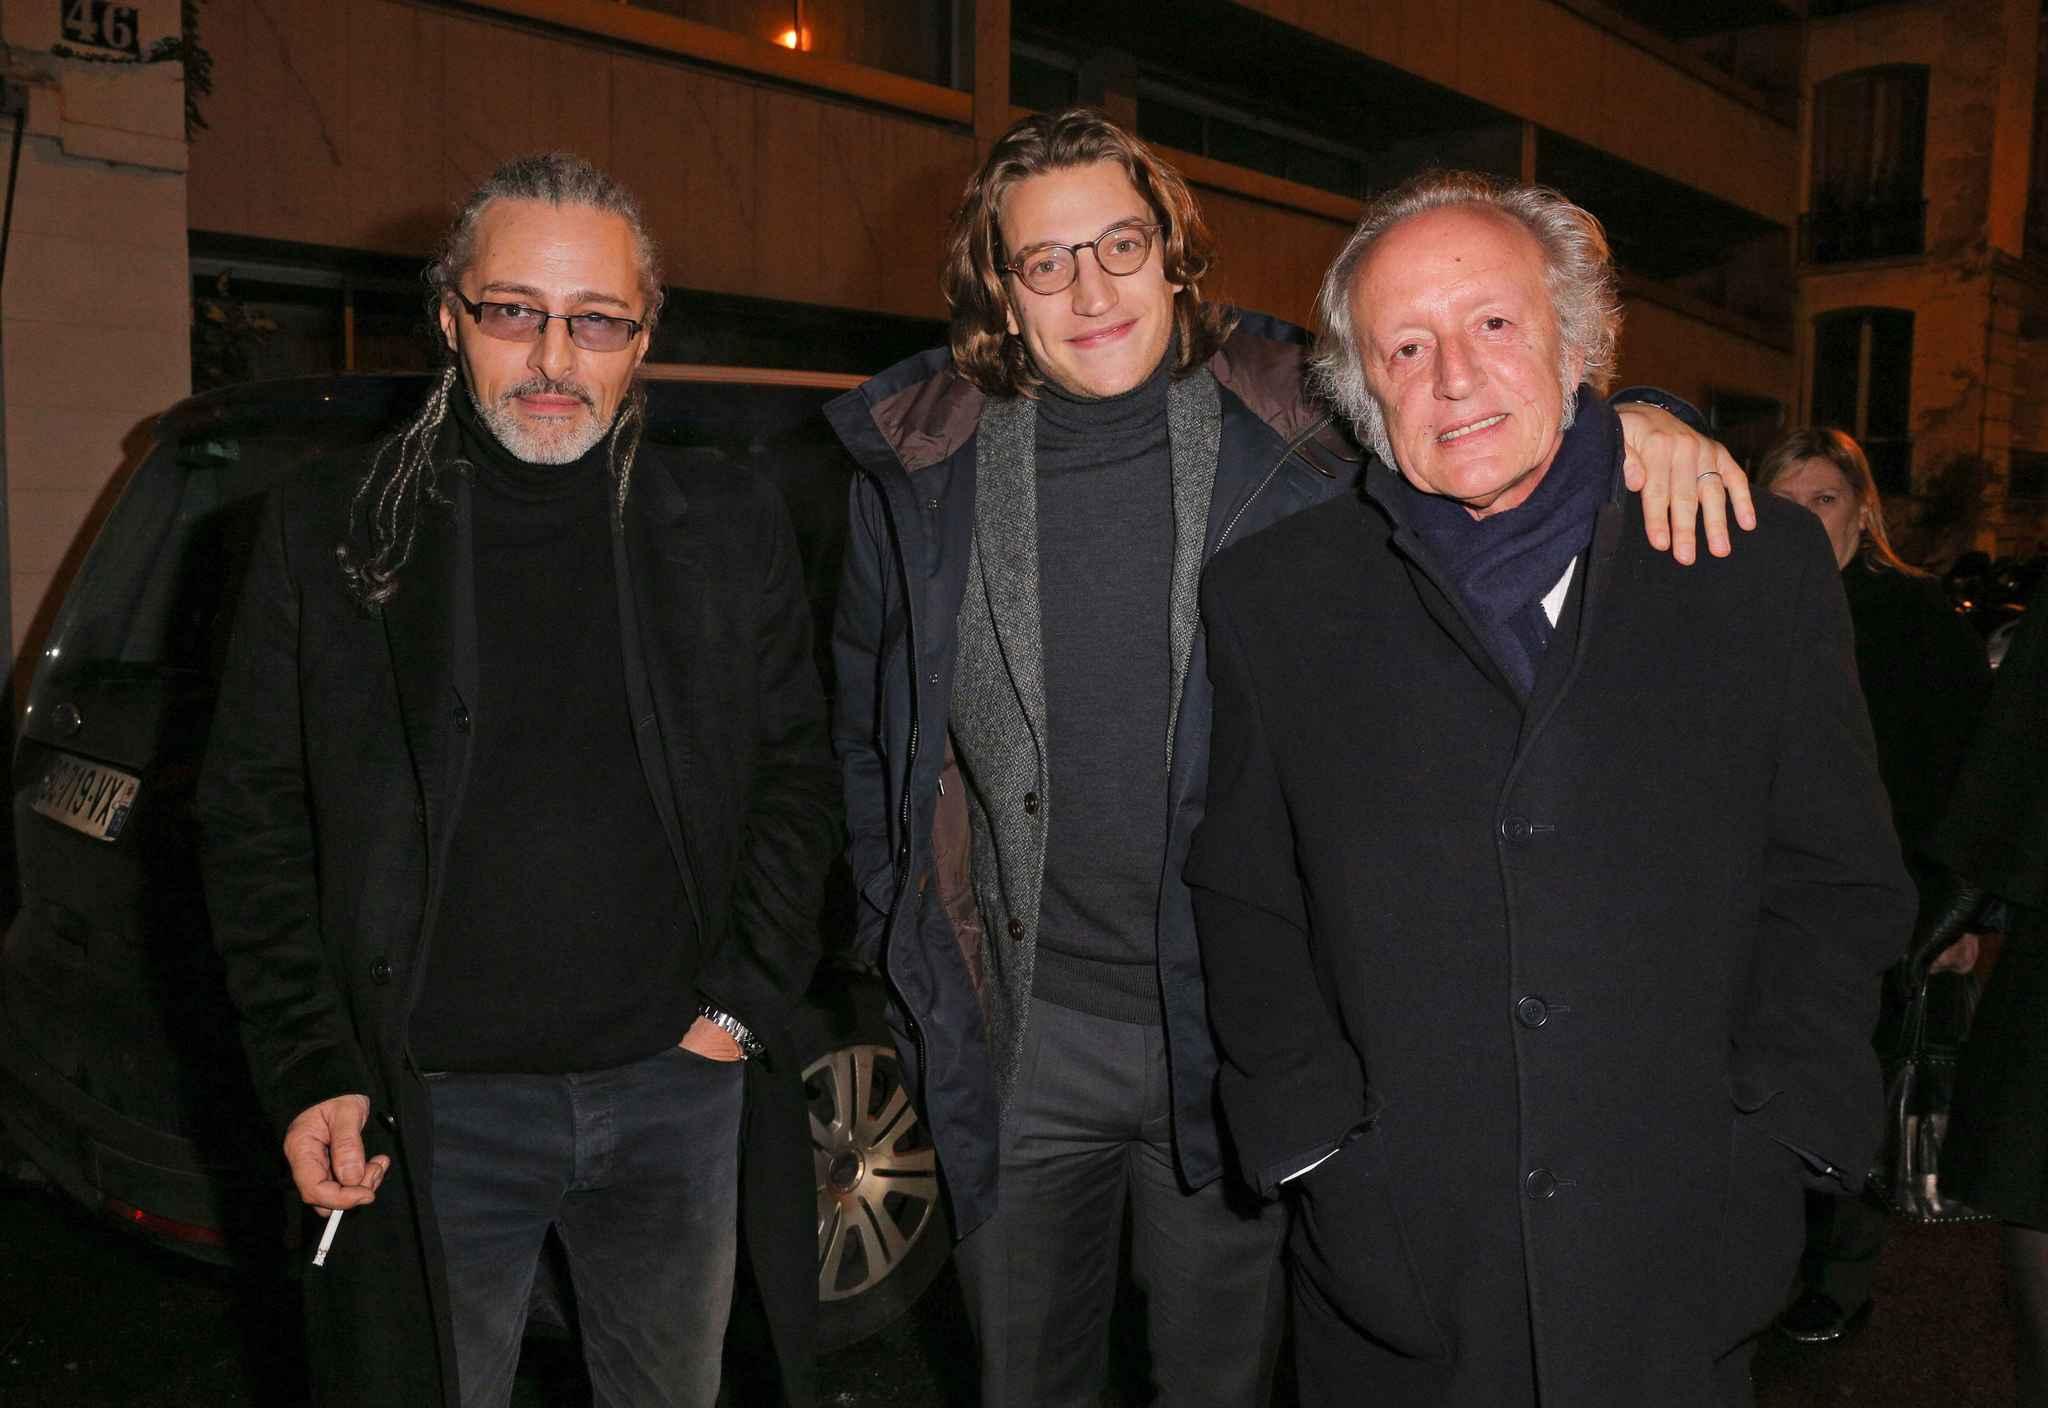 (L-R) The millionaire philanthropist Jean-Baptiste Descroix-Vernier, Jean Sarkozy and Didier Barbelivien leave the Nicolas Sarkozy's birthday party in Paris. France, January 30, 2015./PLV_1322.01/Credit:PLV/SIPA/1501311341